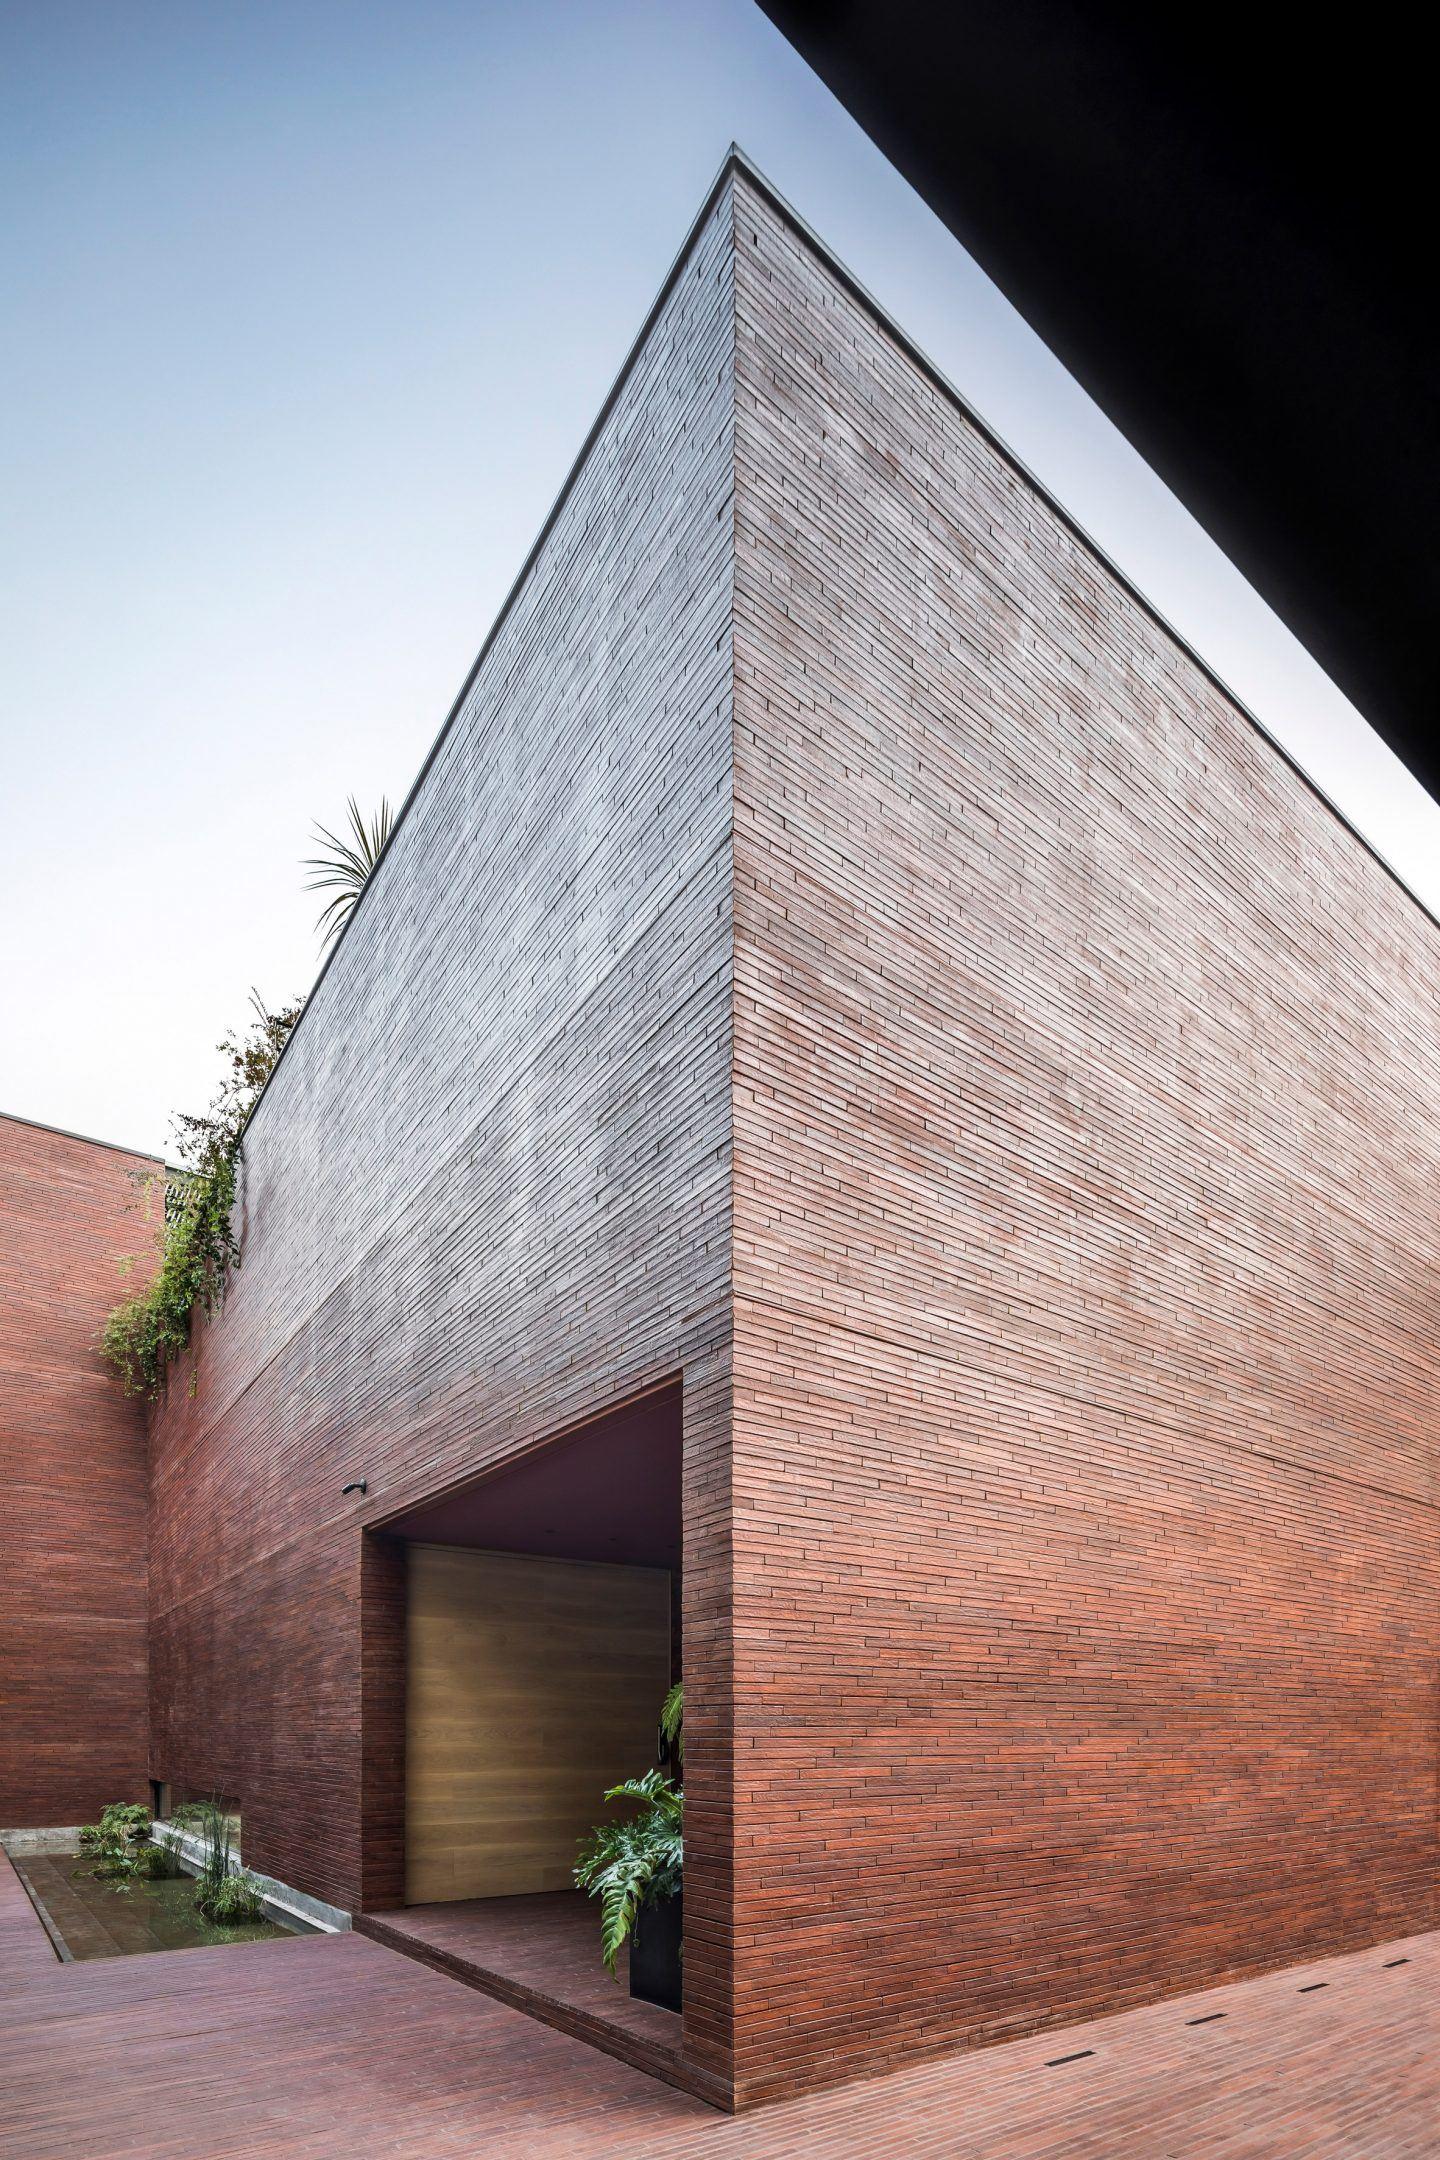 IGNANT-Architecture-Esrawe-Studio-Casa-Sierra-Fría-Cesar-Bejar-02